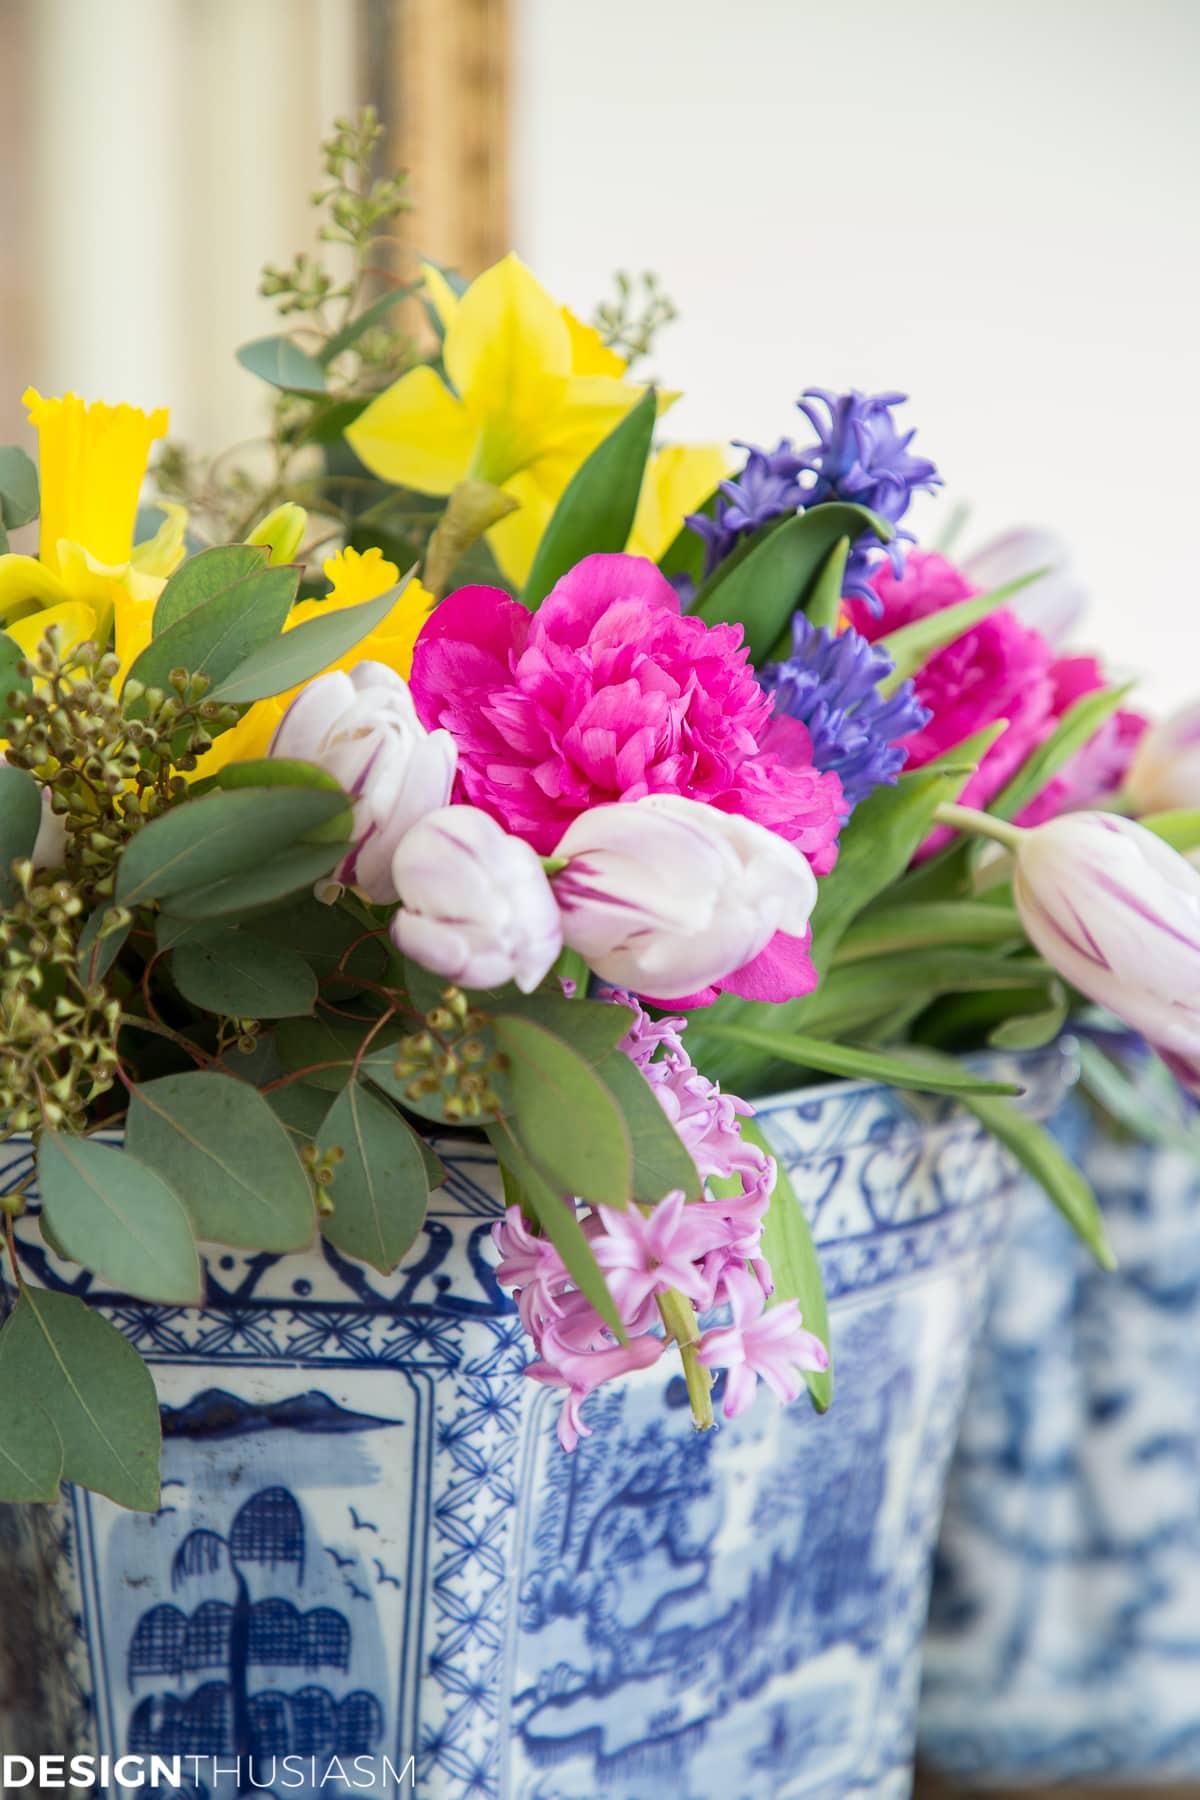 healthy lifestyle fresh flowers